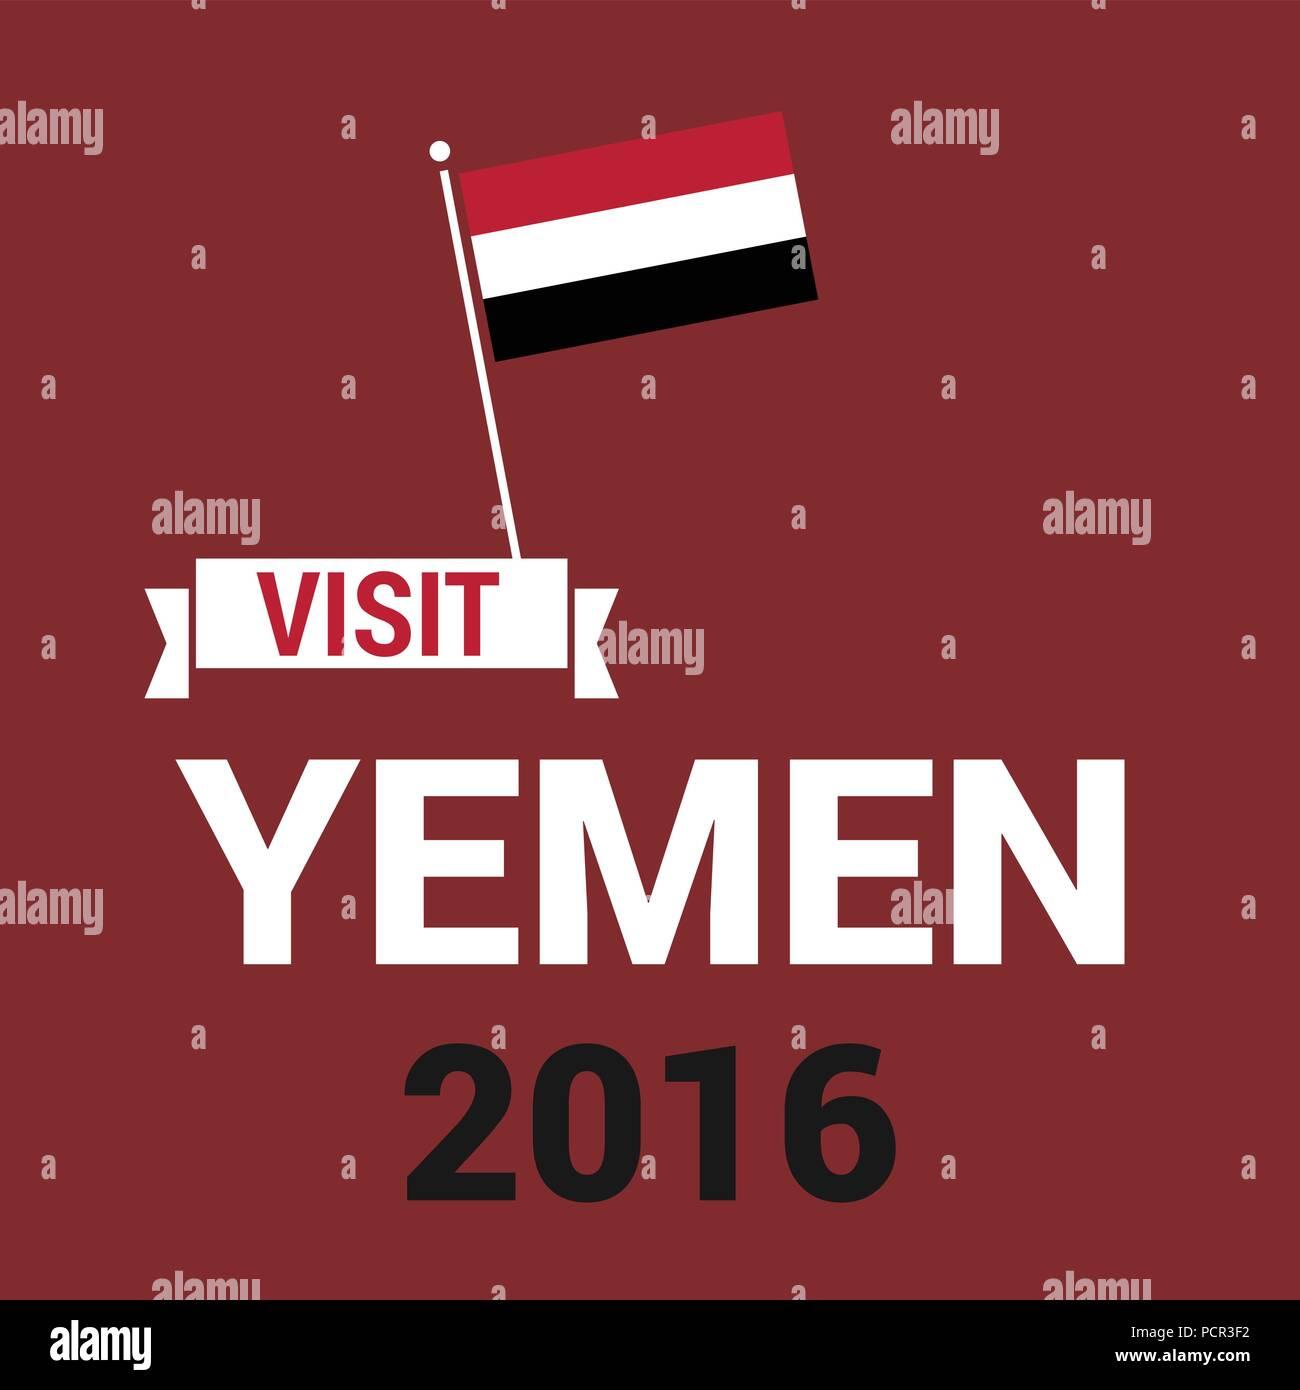 Yemen Independence day design card vector - Stock Vector